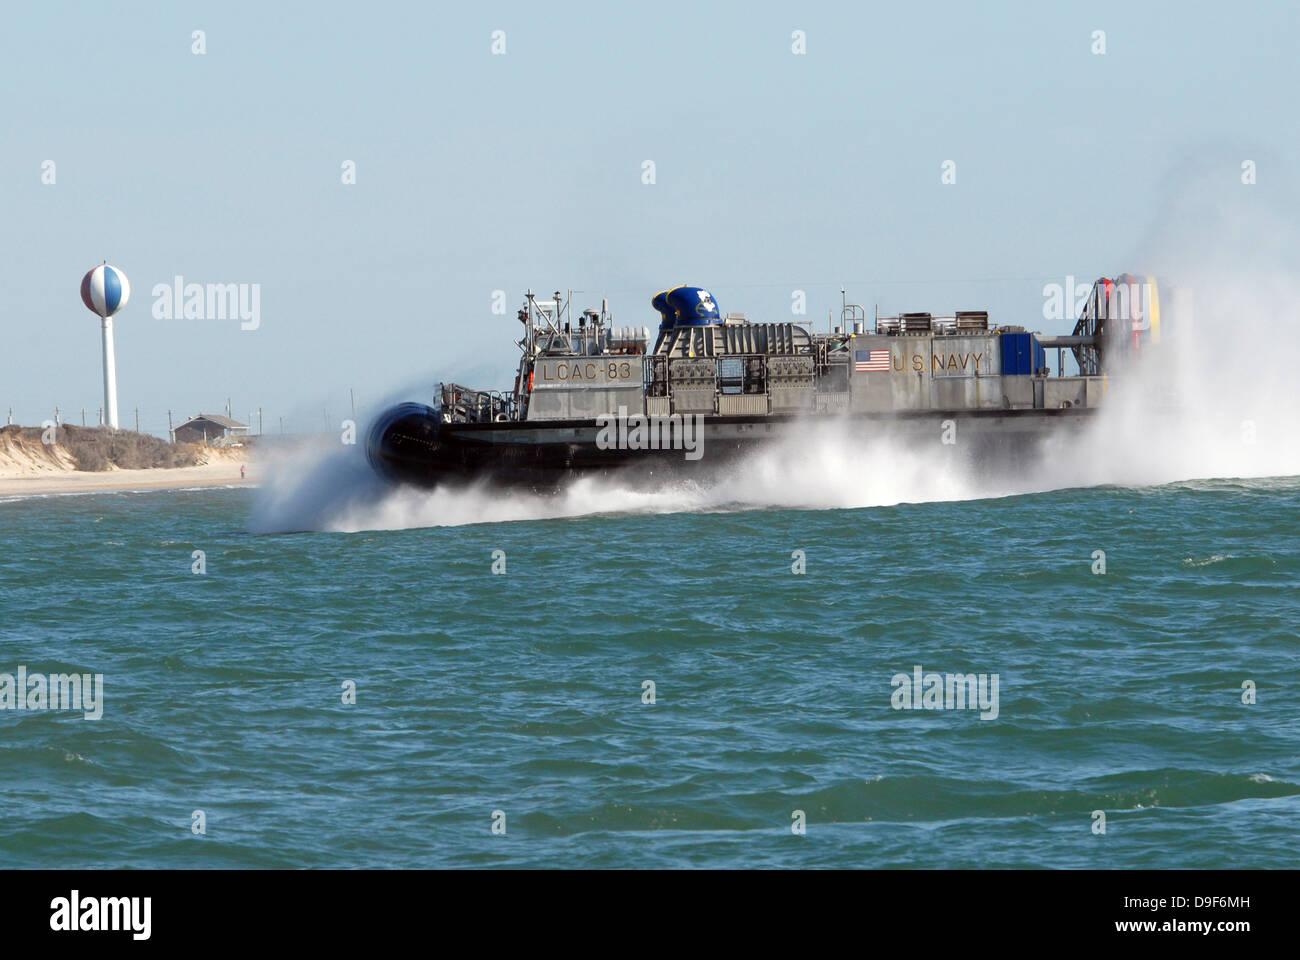 A landing craft air cushion prepares to land on the beach. Stock Photo